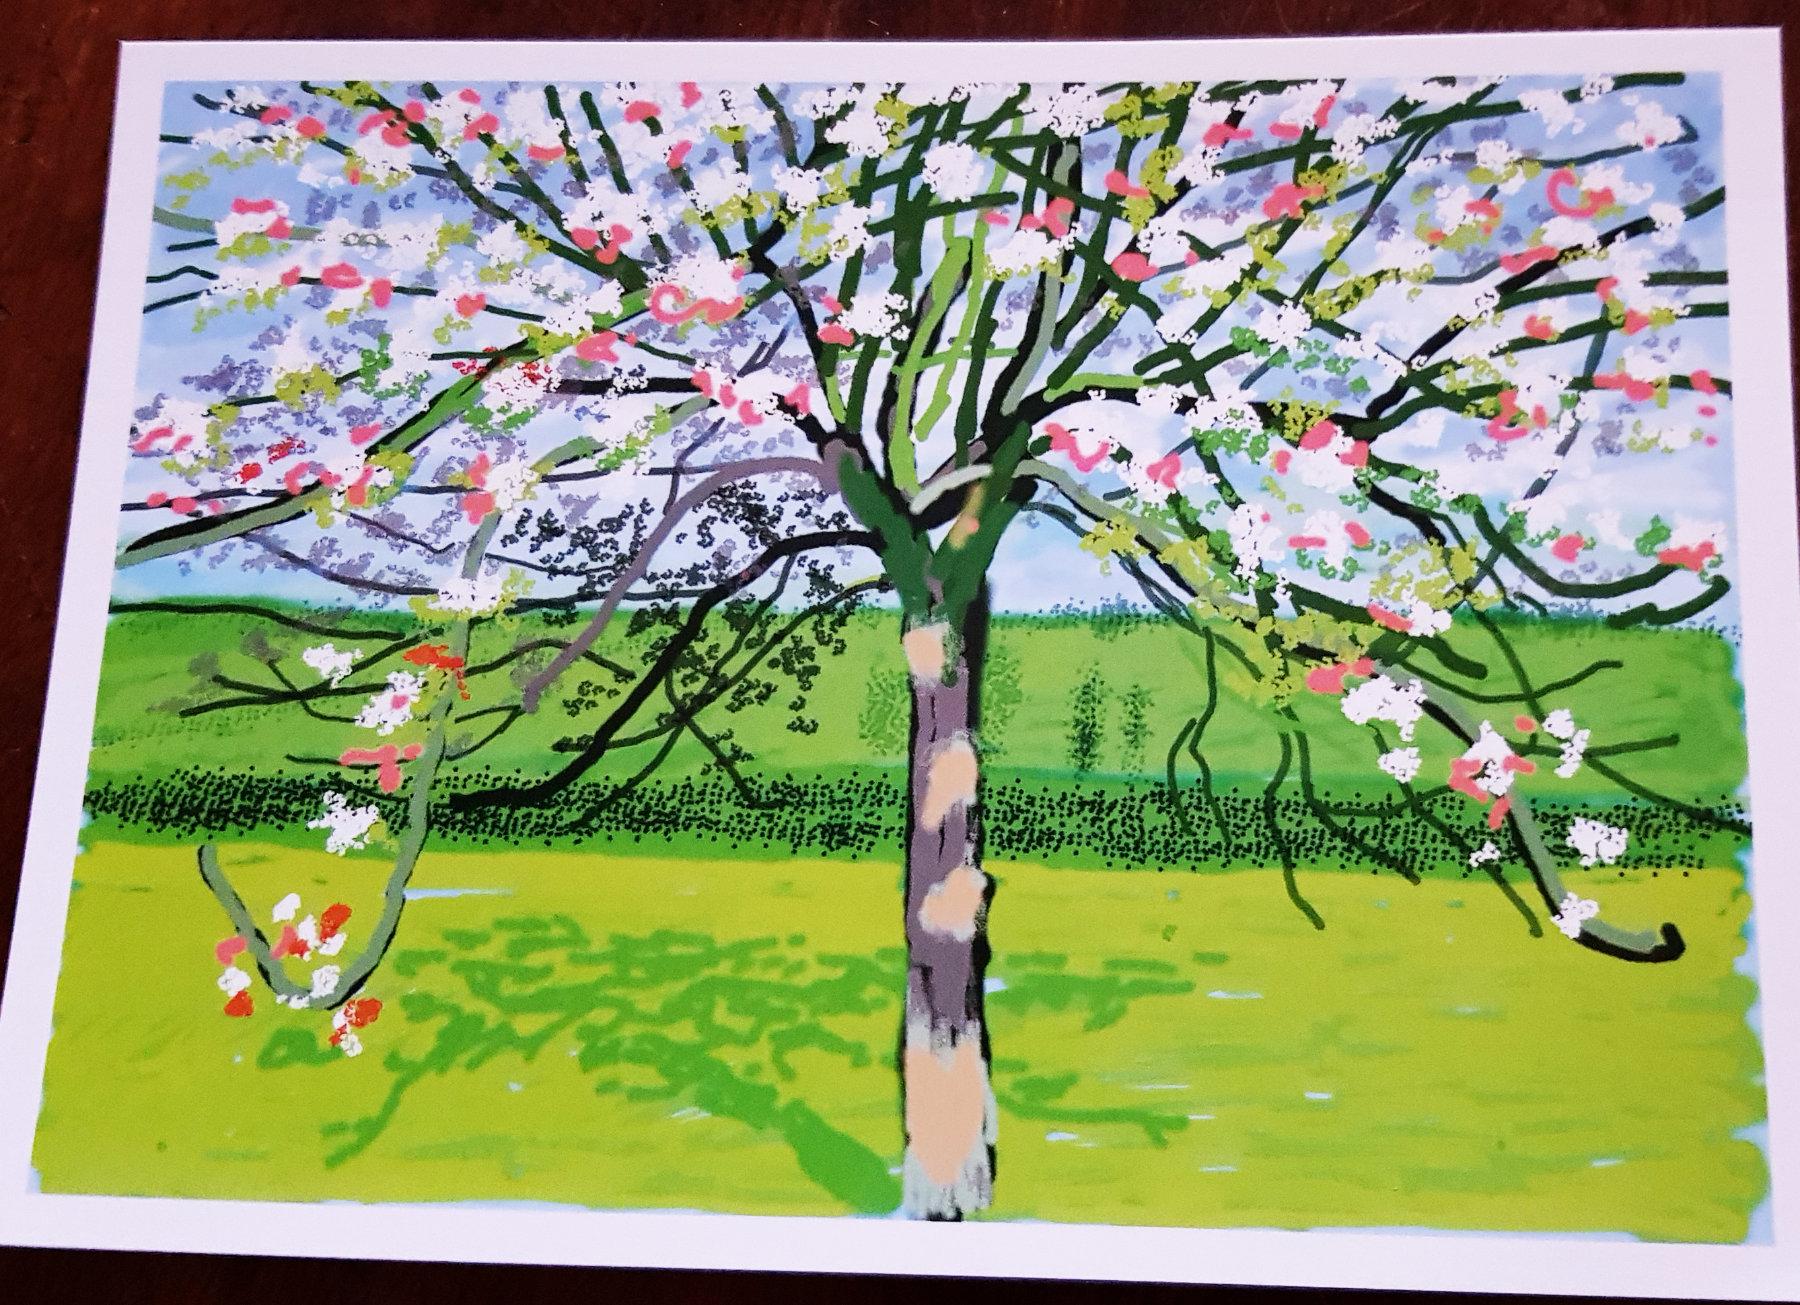 David Hockney number 209, 17th April 2020